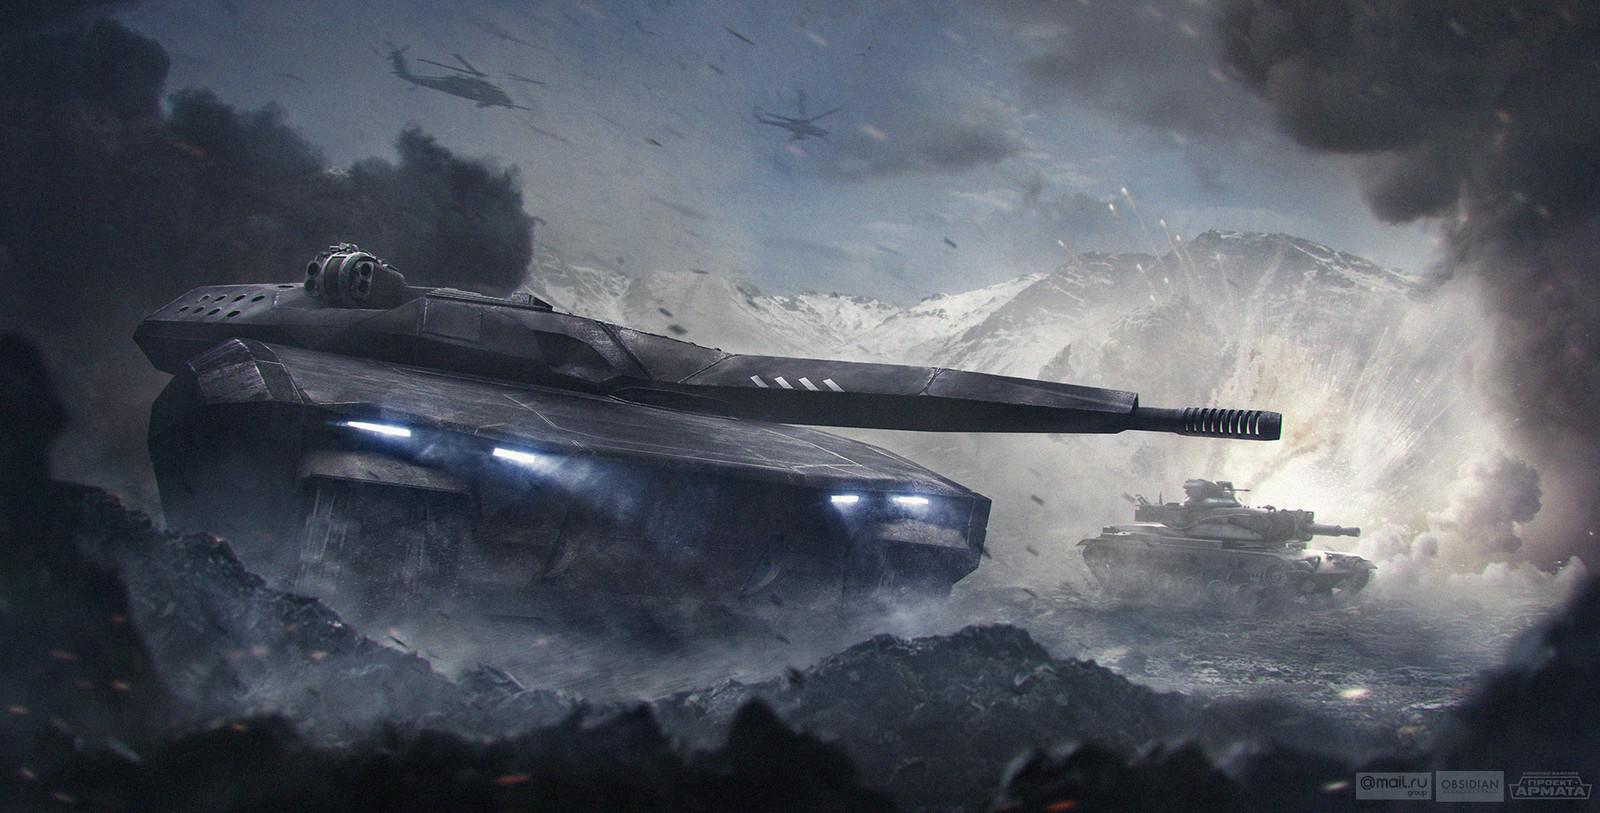 Futuristic PL-01 with gorgeous M60A2 Patton starship